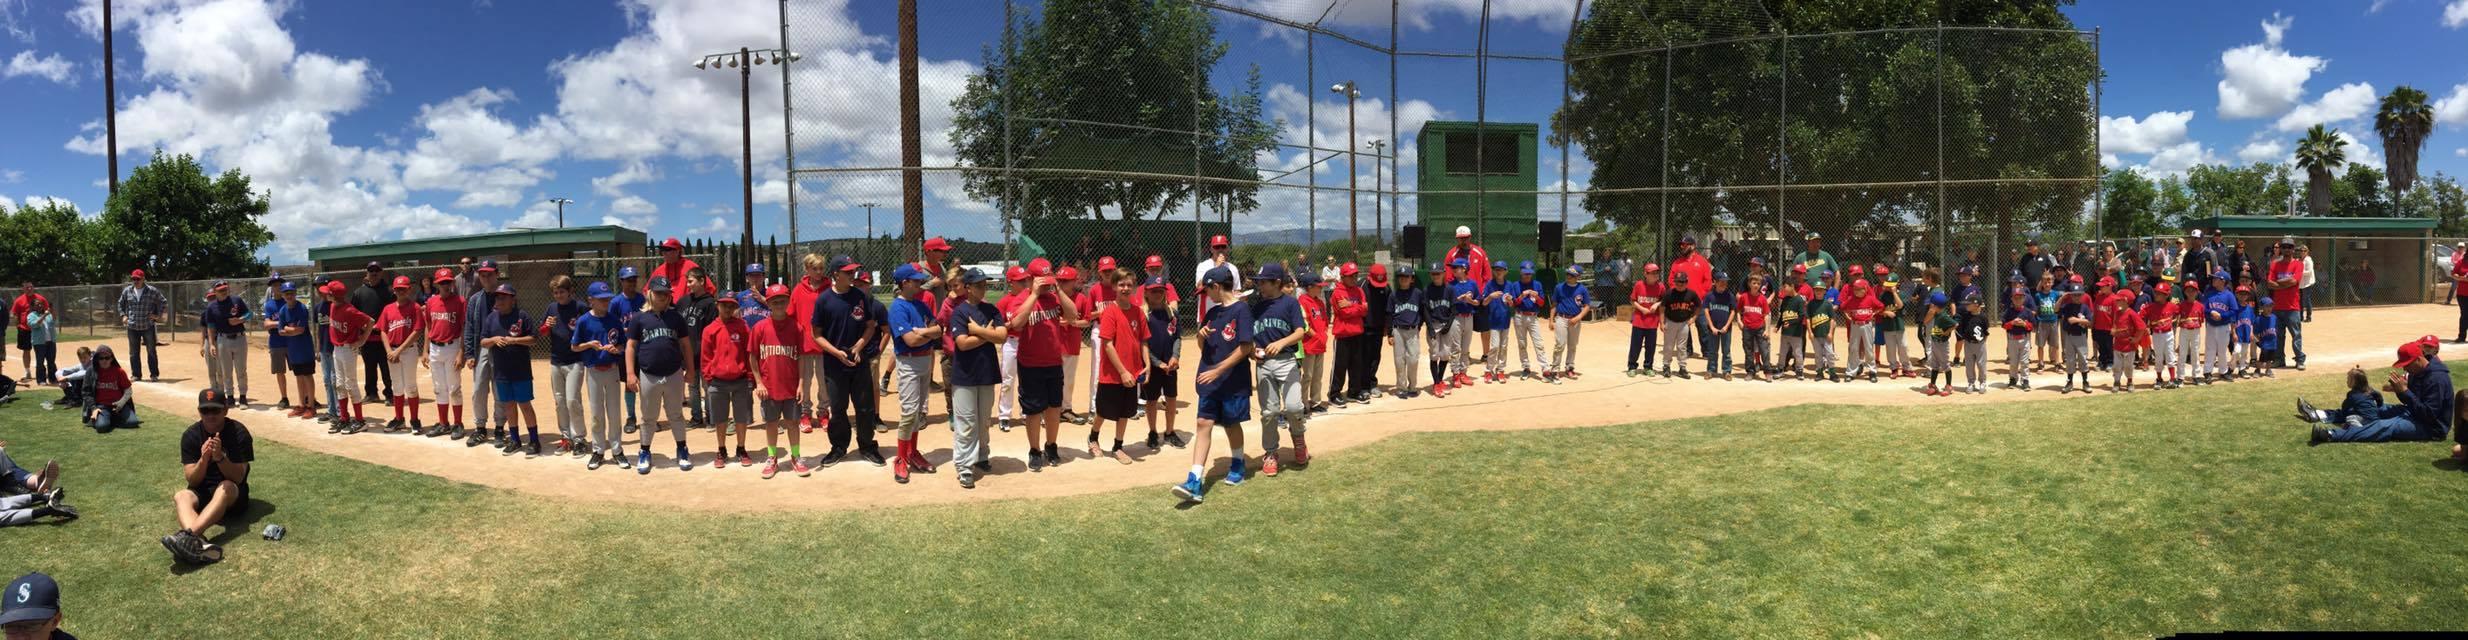 Fallbrook Youth Baseball